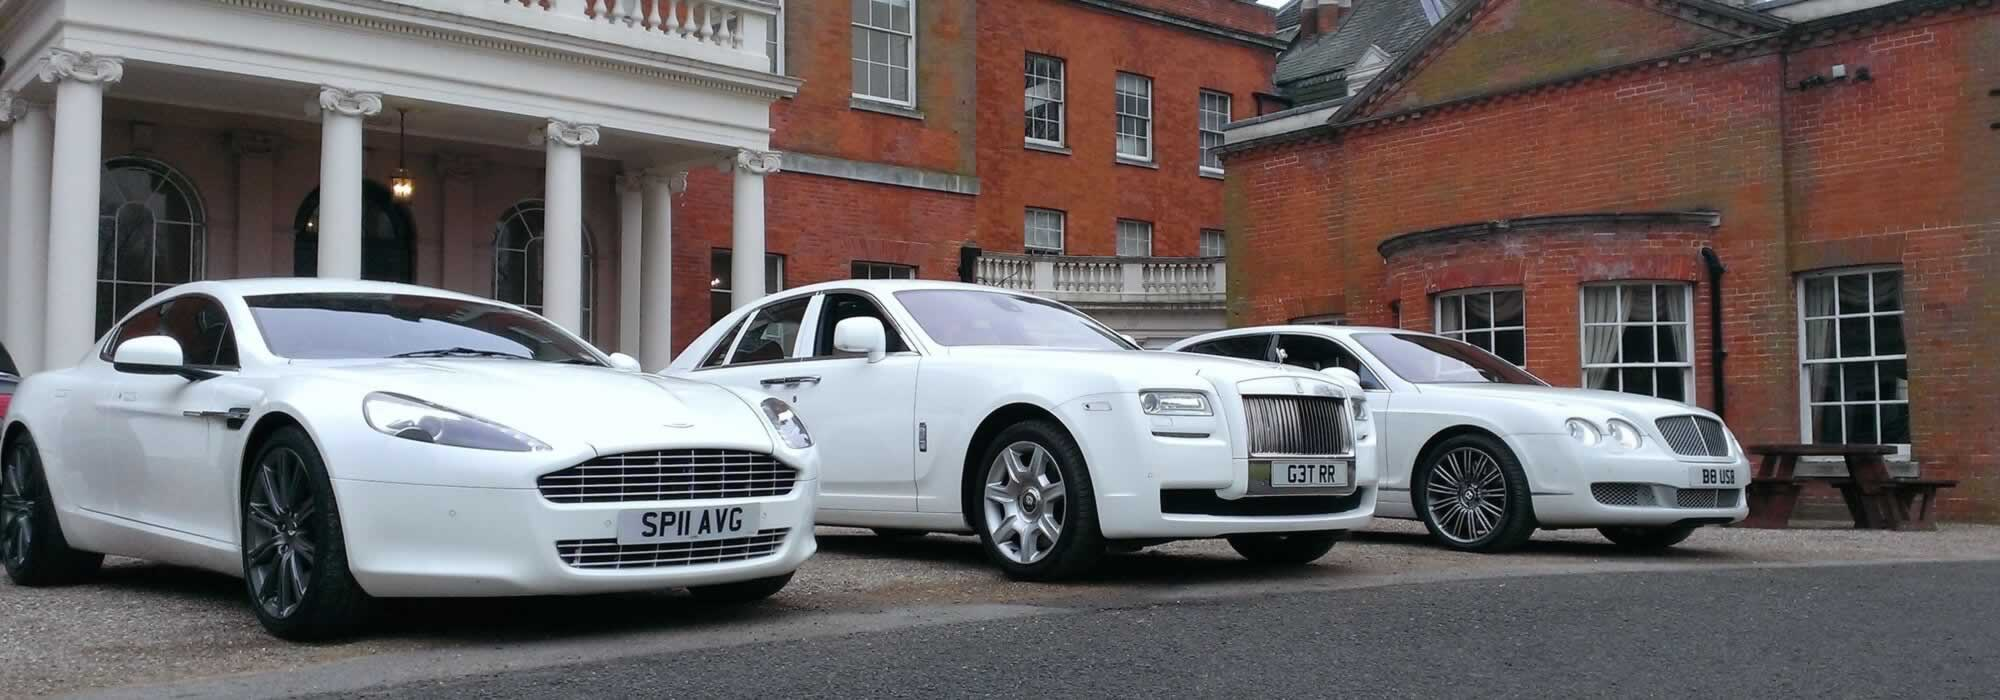 Wedding Car Hire Herts Limos